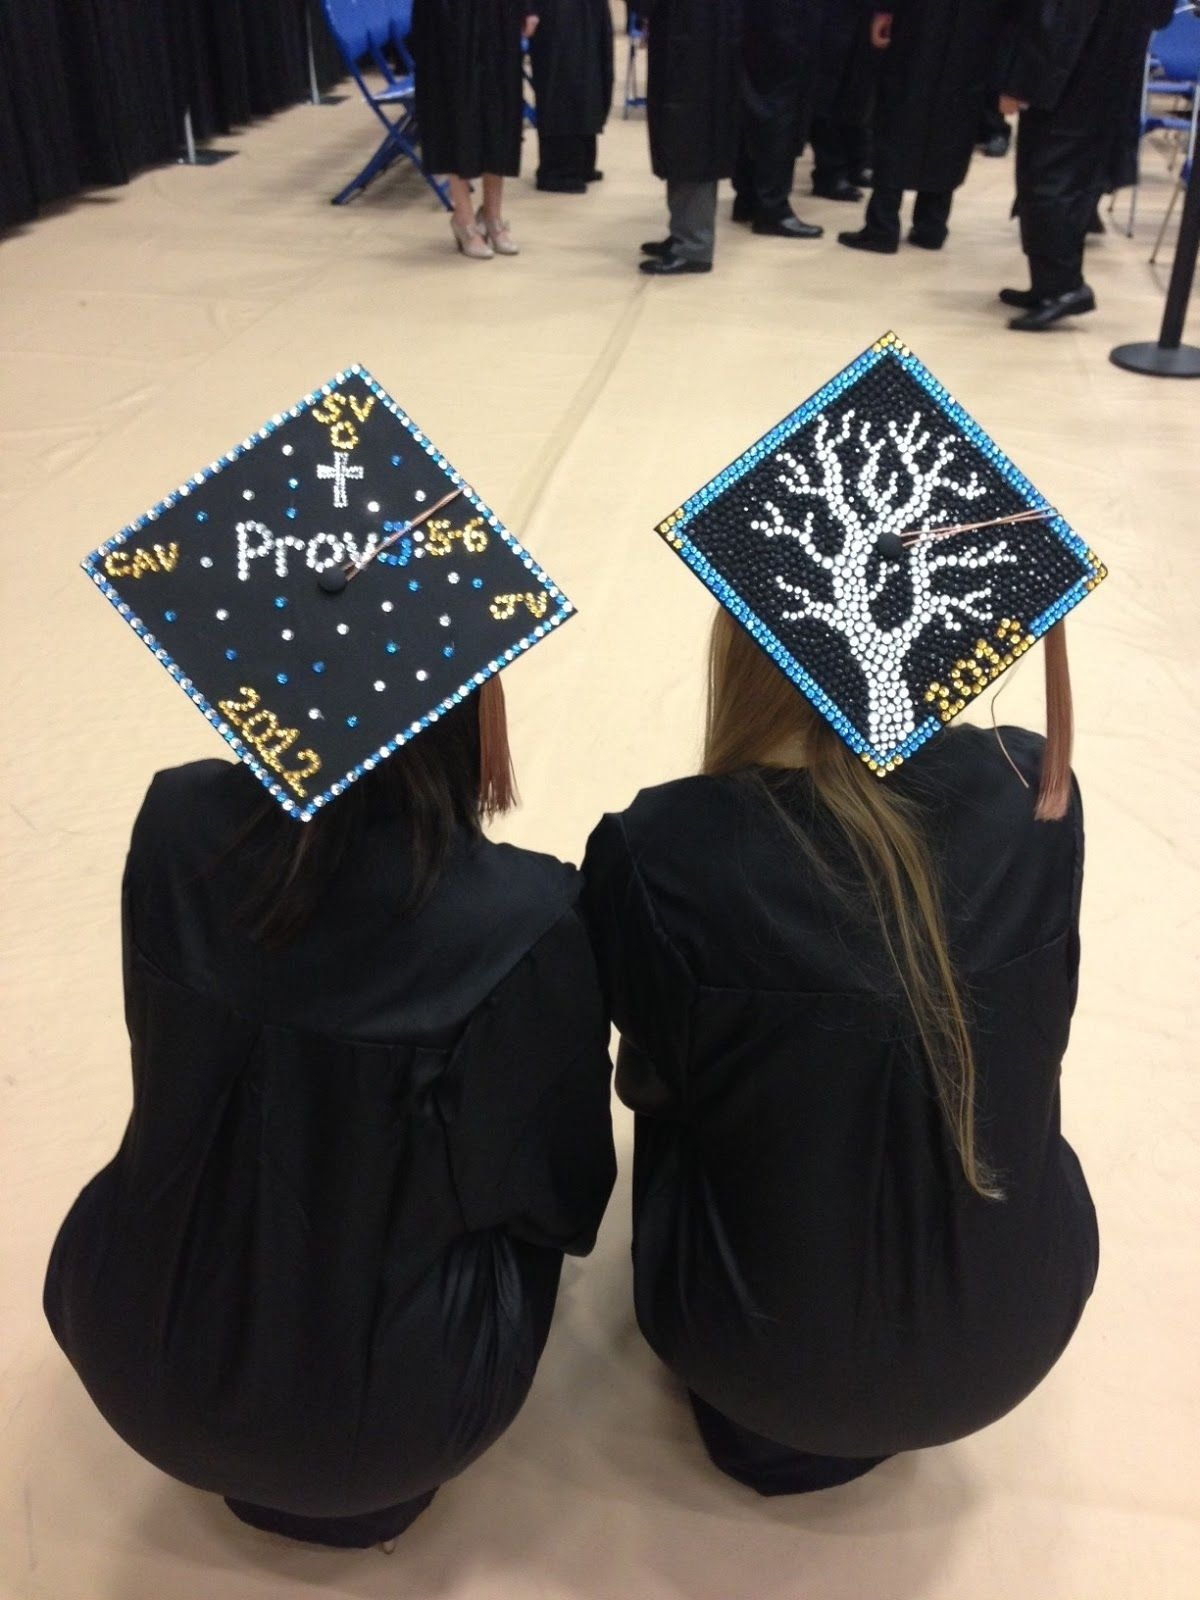 10 Lovely High School Graduation Cap Decoration Ideas graduation ideas graduation hats decorations ideas graduation 2020